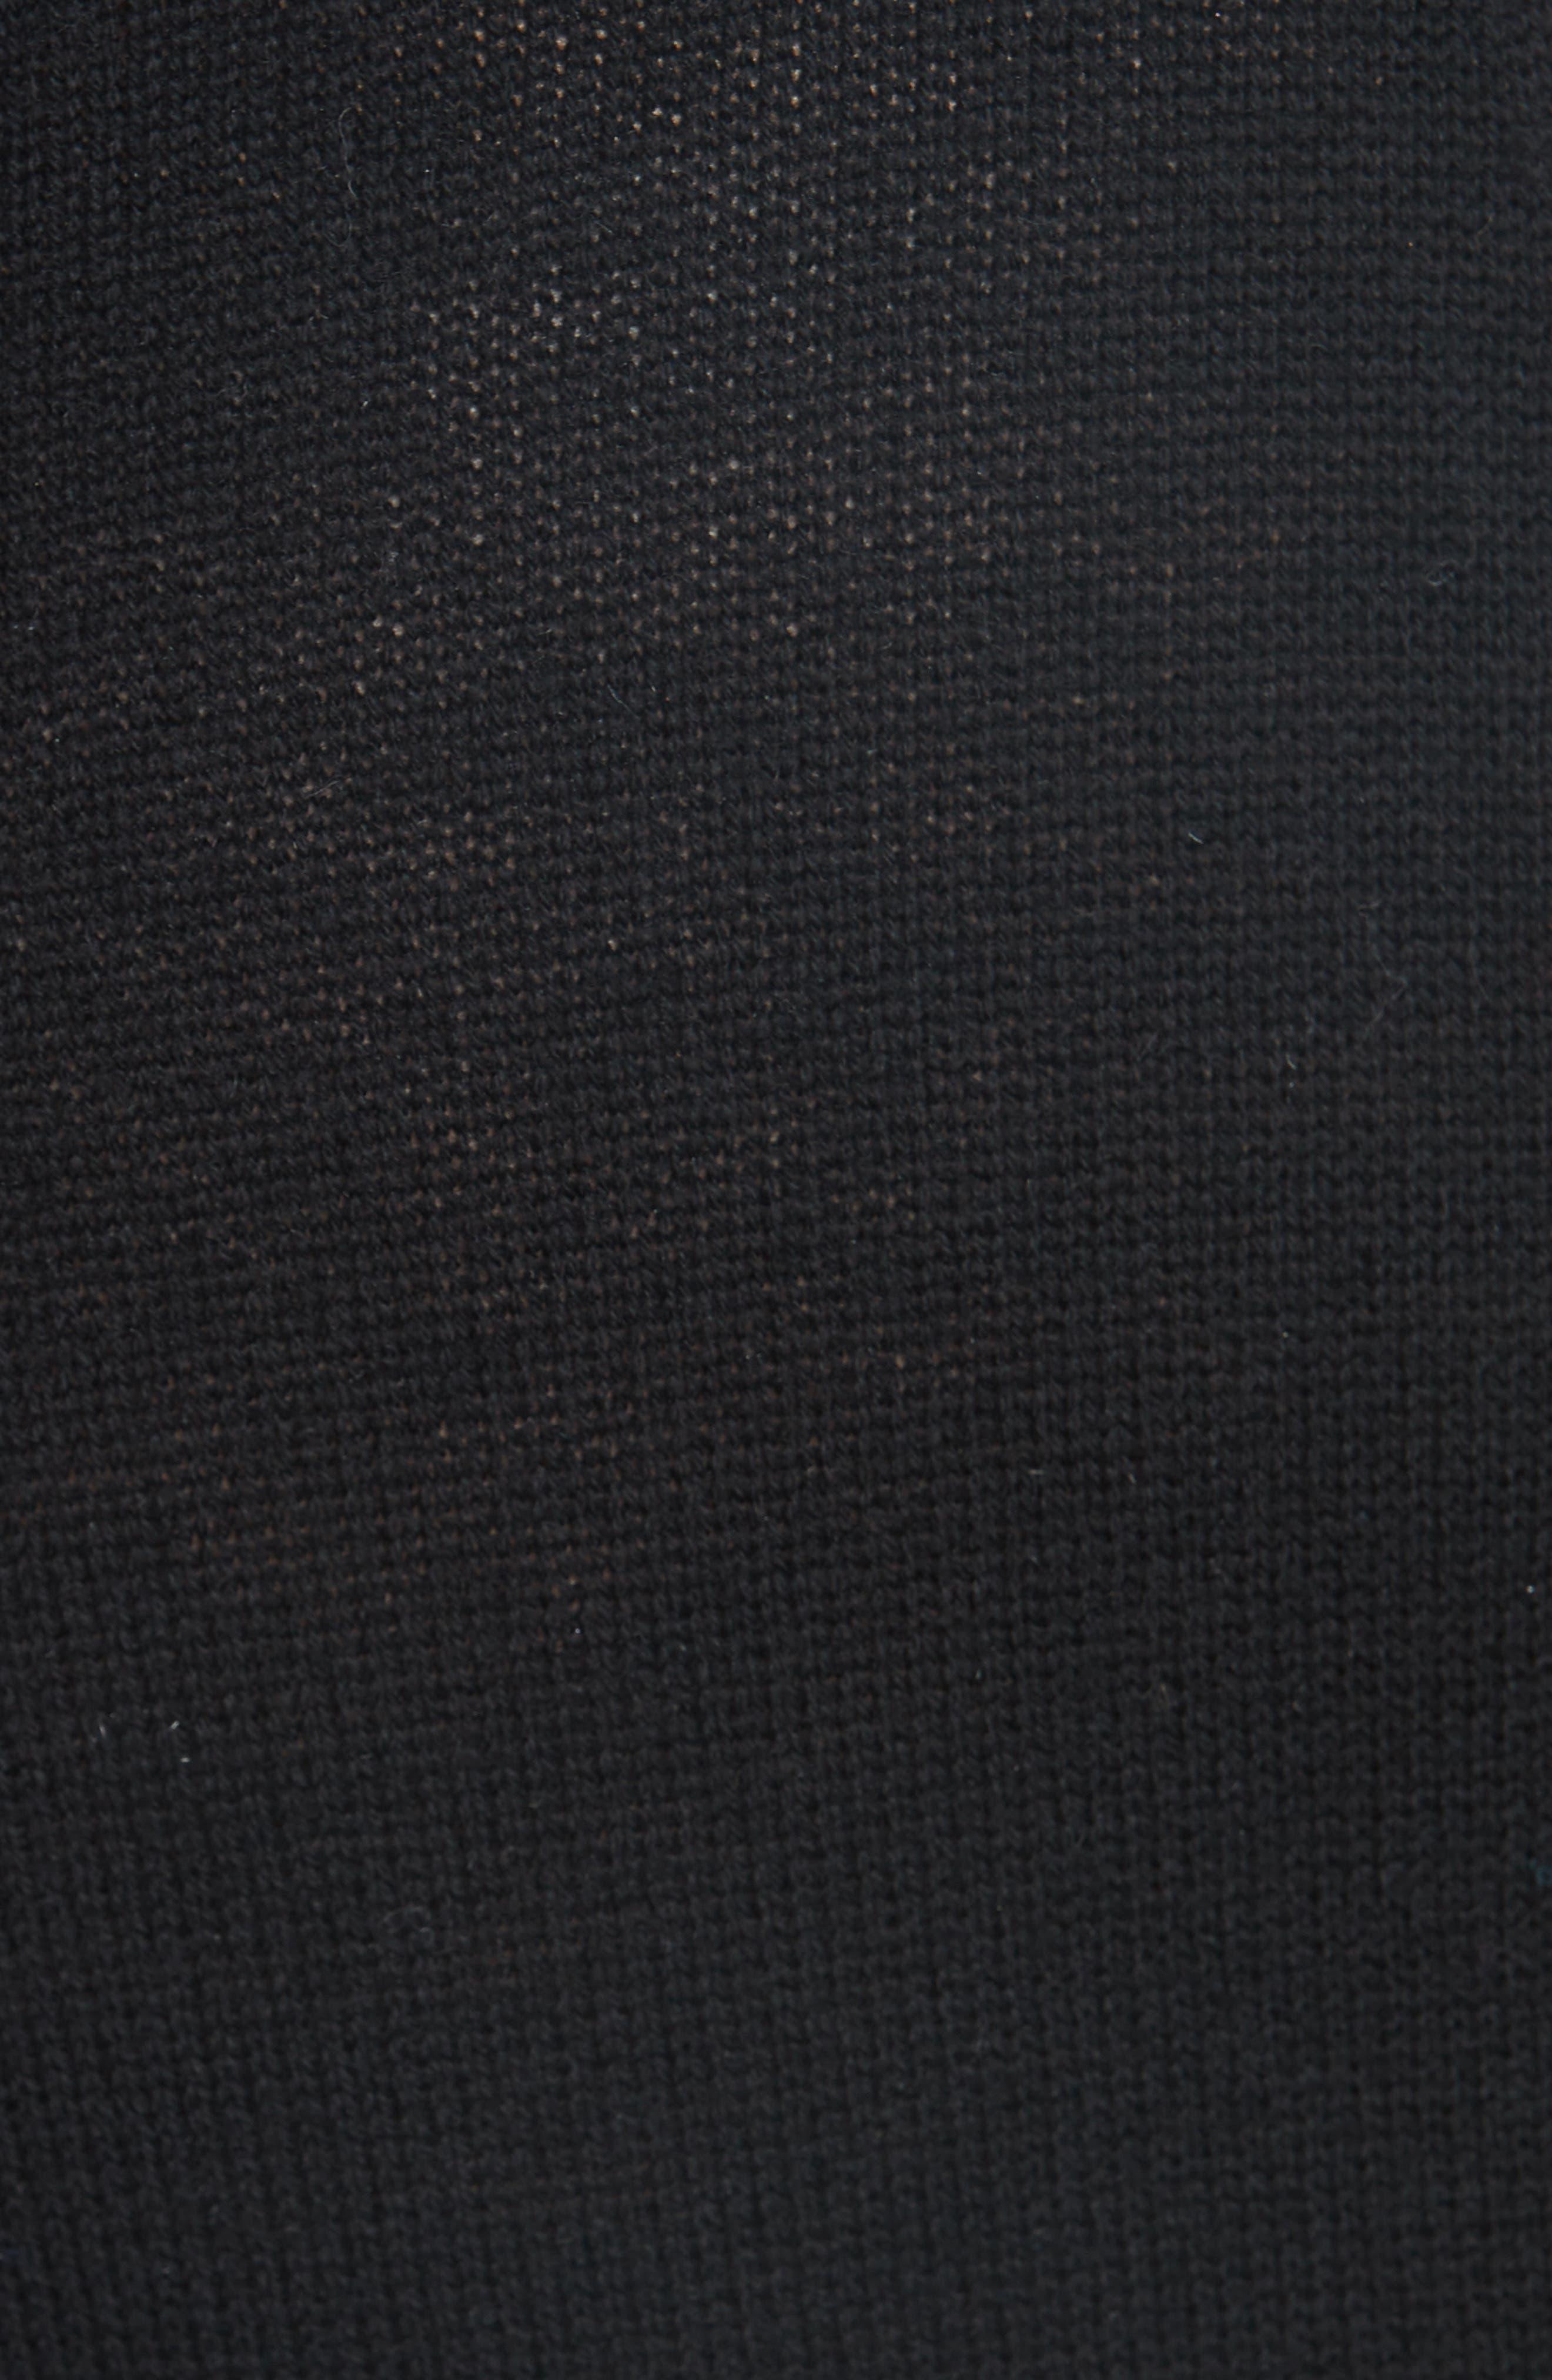 Metallic Knit Wool Blend Trousers,                             Alternate thumbnail 5, color,                             BLACK